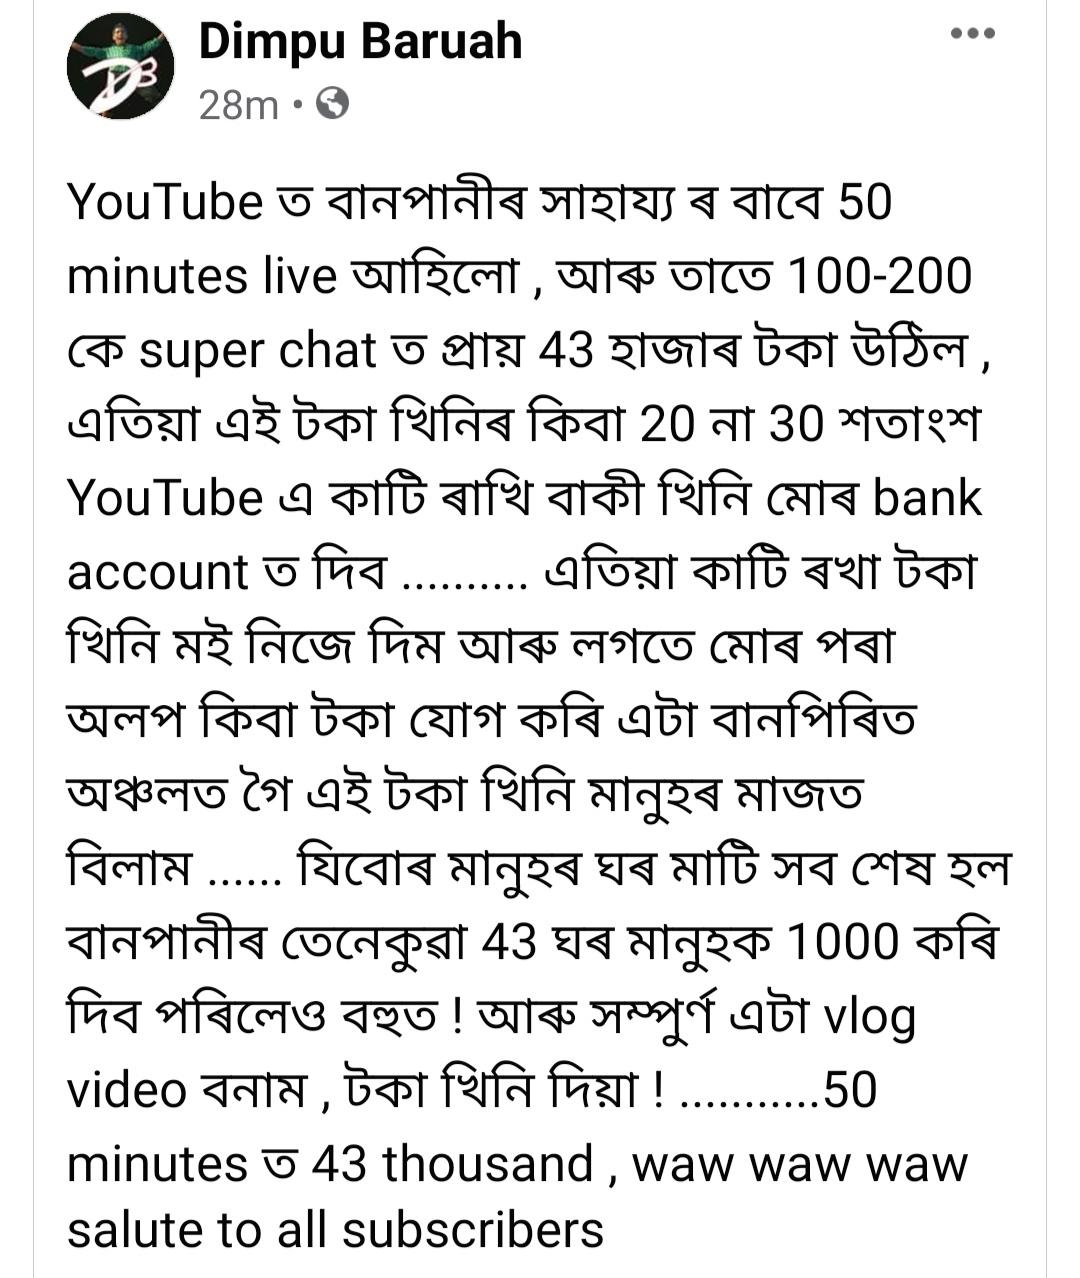 Assam Youtuber Dimpu Baruah raises money for flood victims via LiveStream